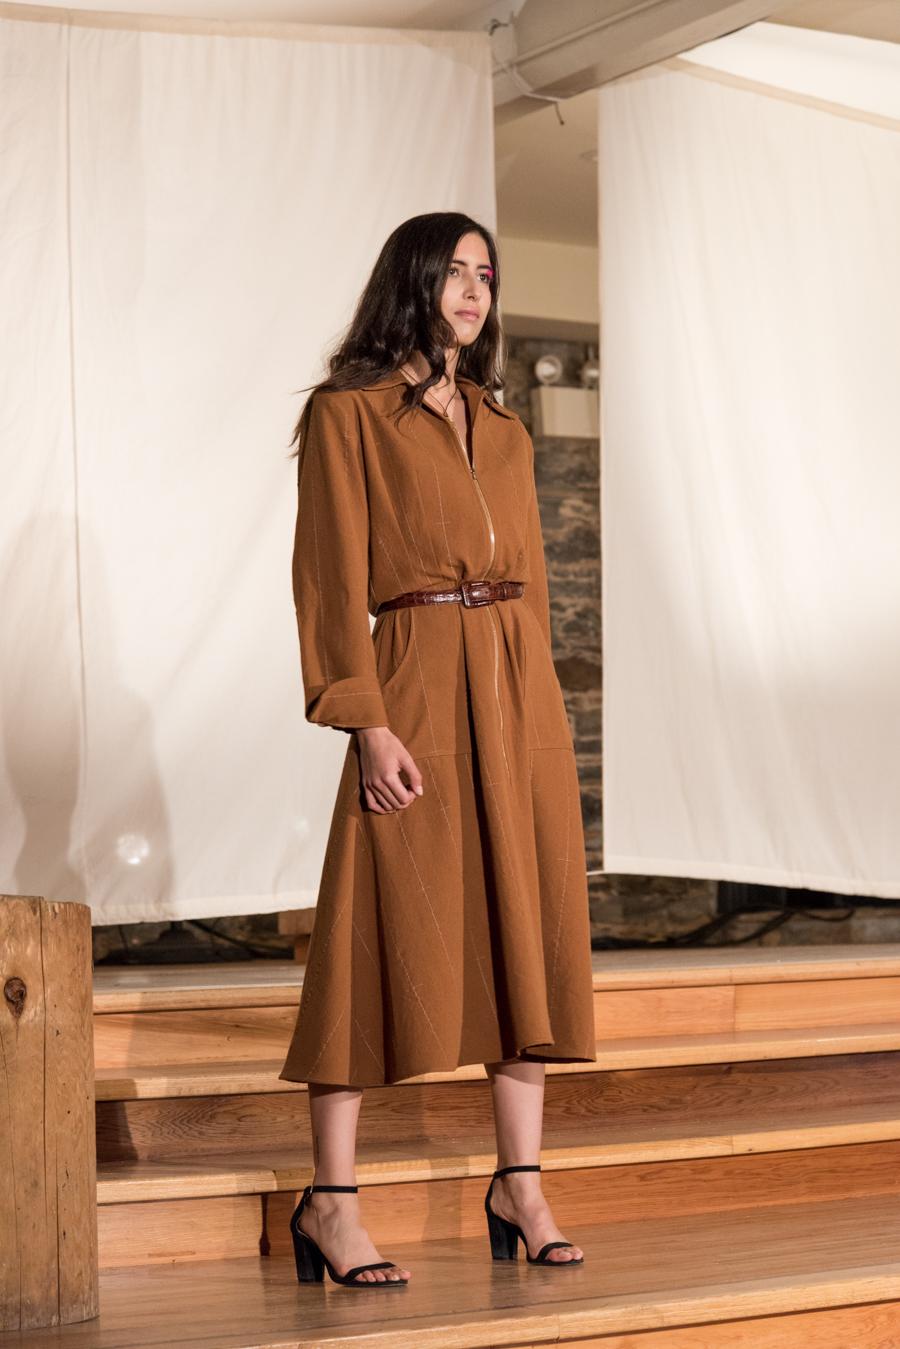 Goods Of Conscience 神父さんファッションデザイナー 3